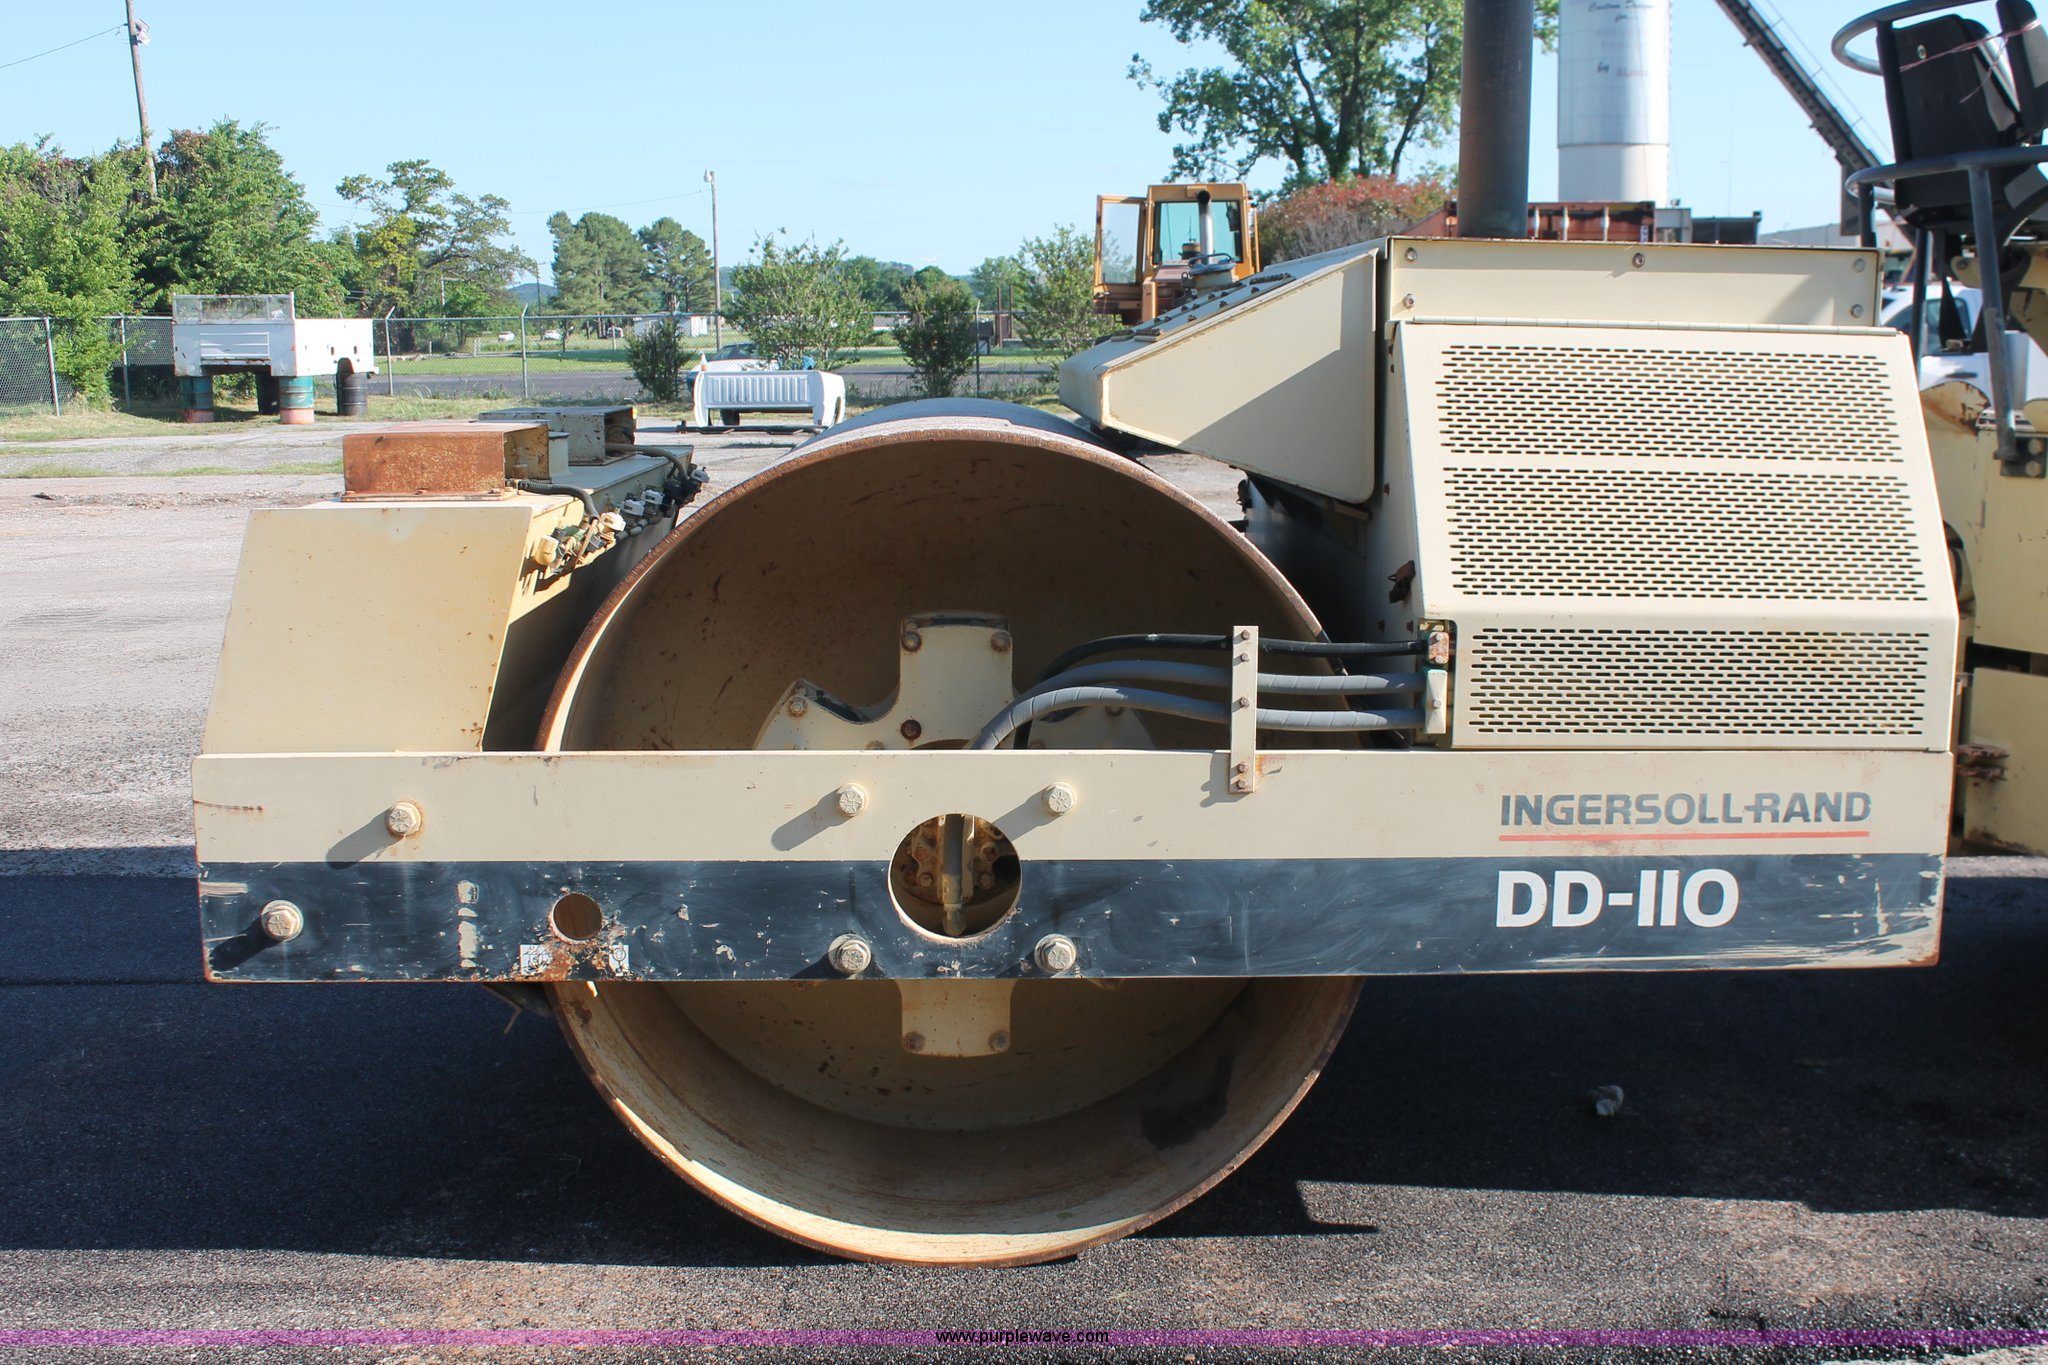 ... Ingersoll Rand DD-110 double drum vibratory roller Full size in new  window ...